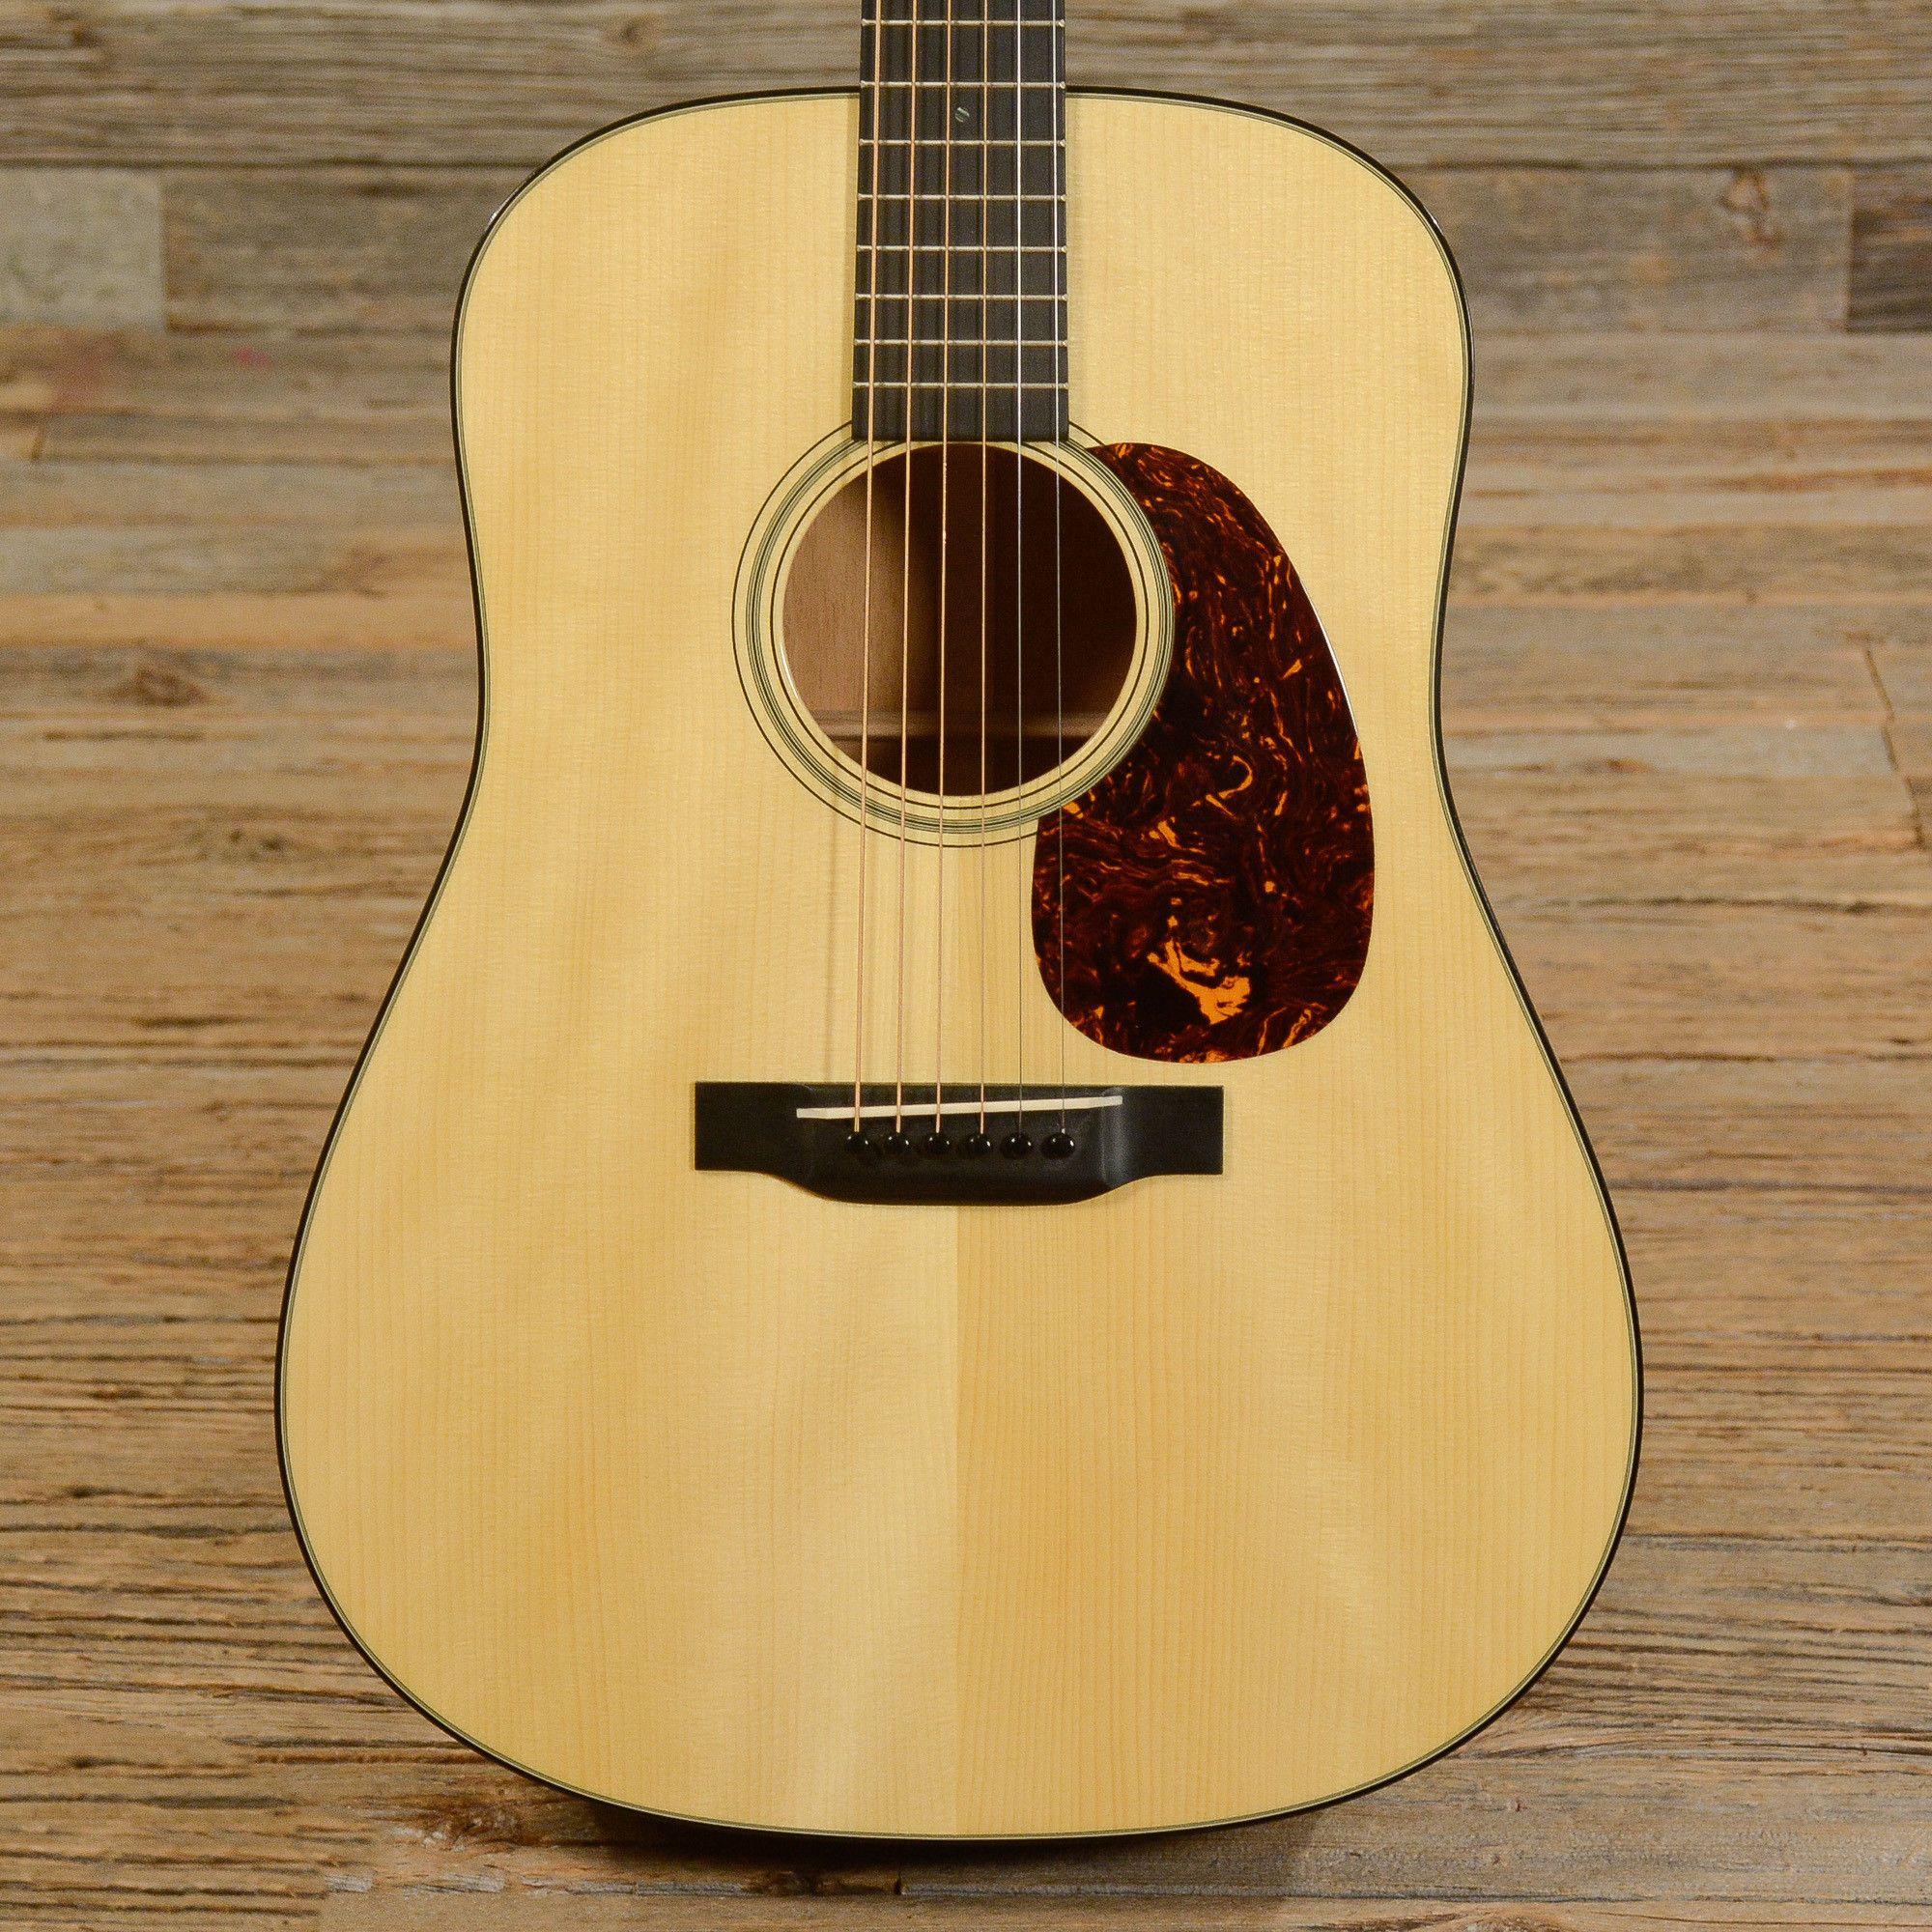 Martin D-18 Golden Era Dreadnought Acoustic 2012 (s262)